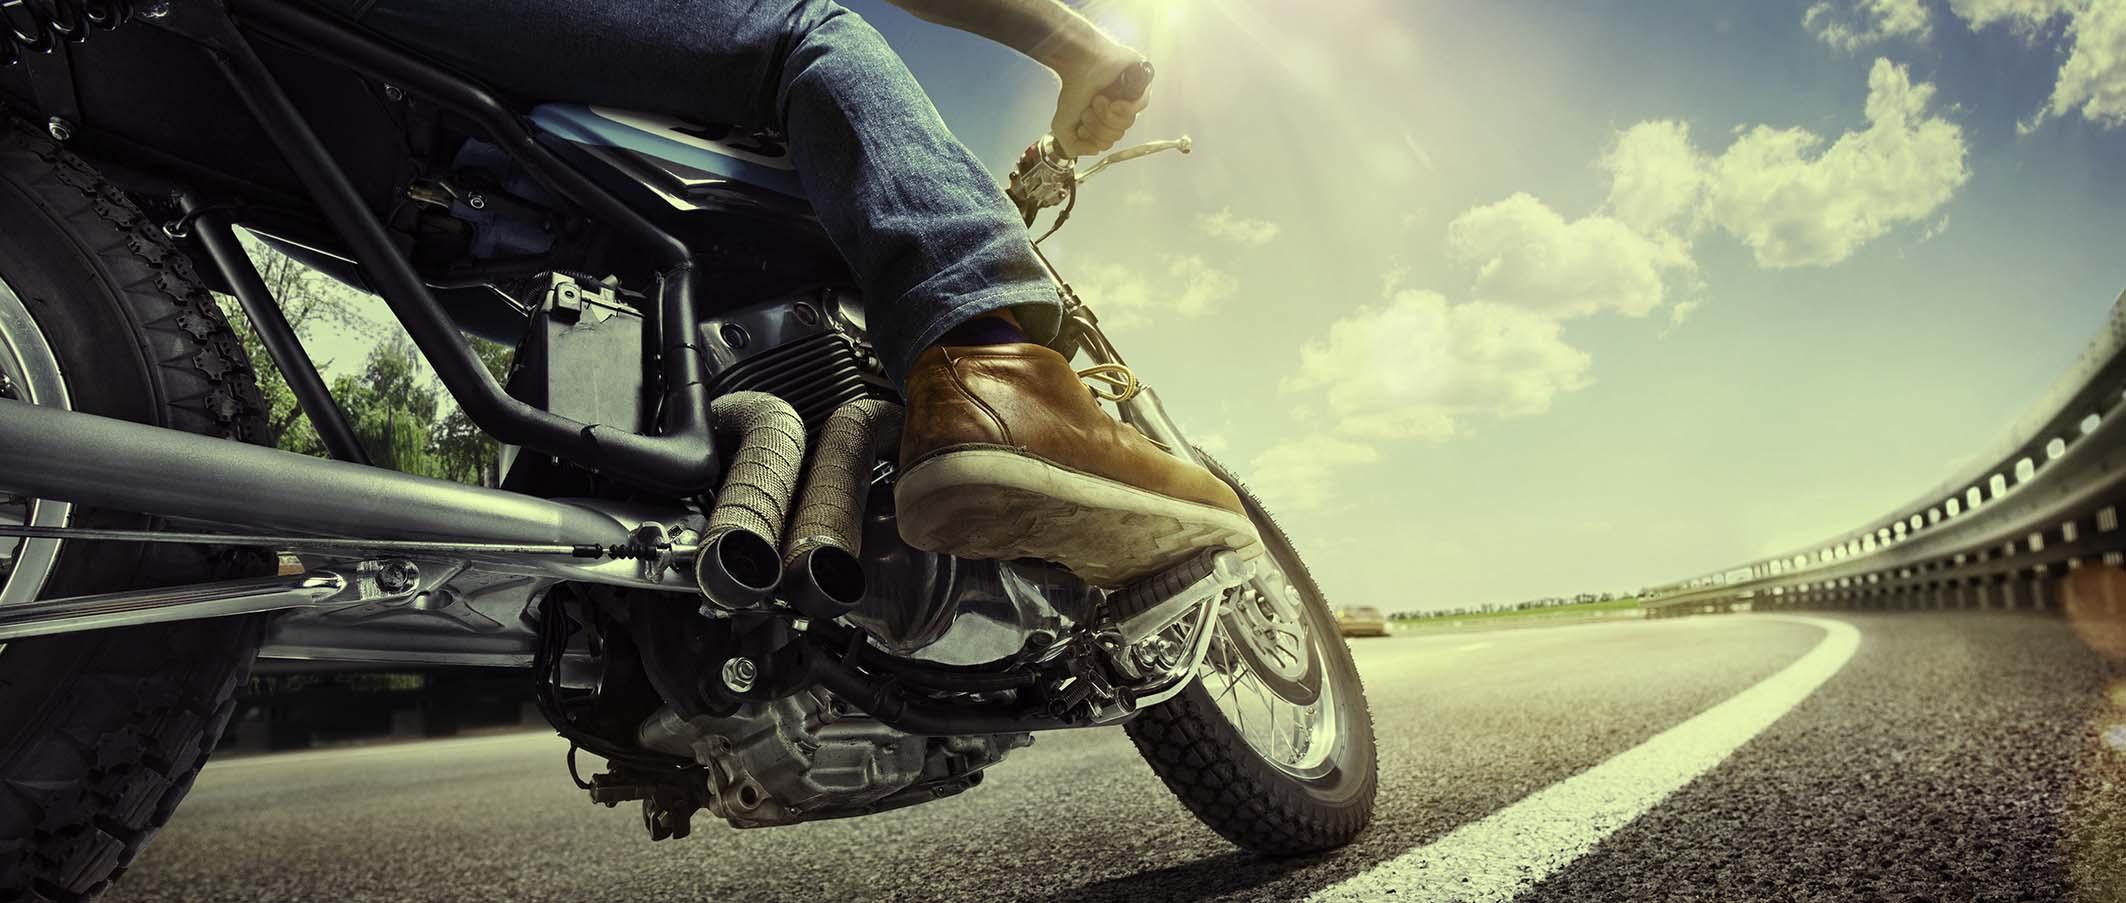 NH Motorcycle insurance